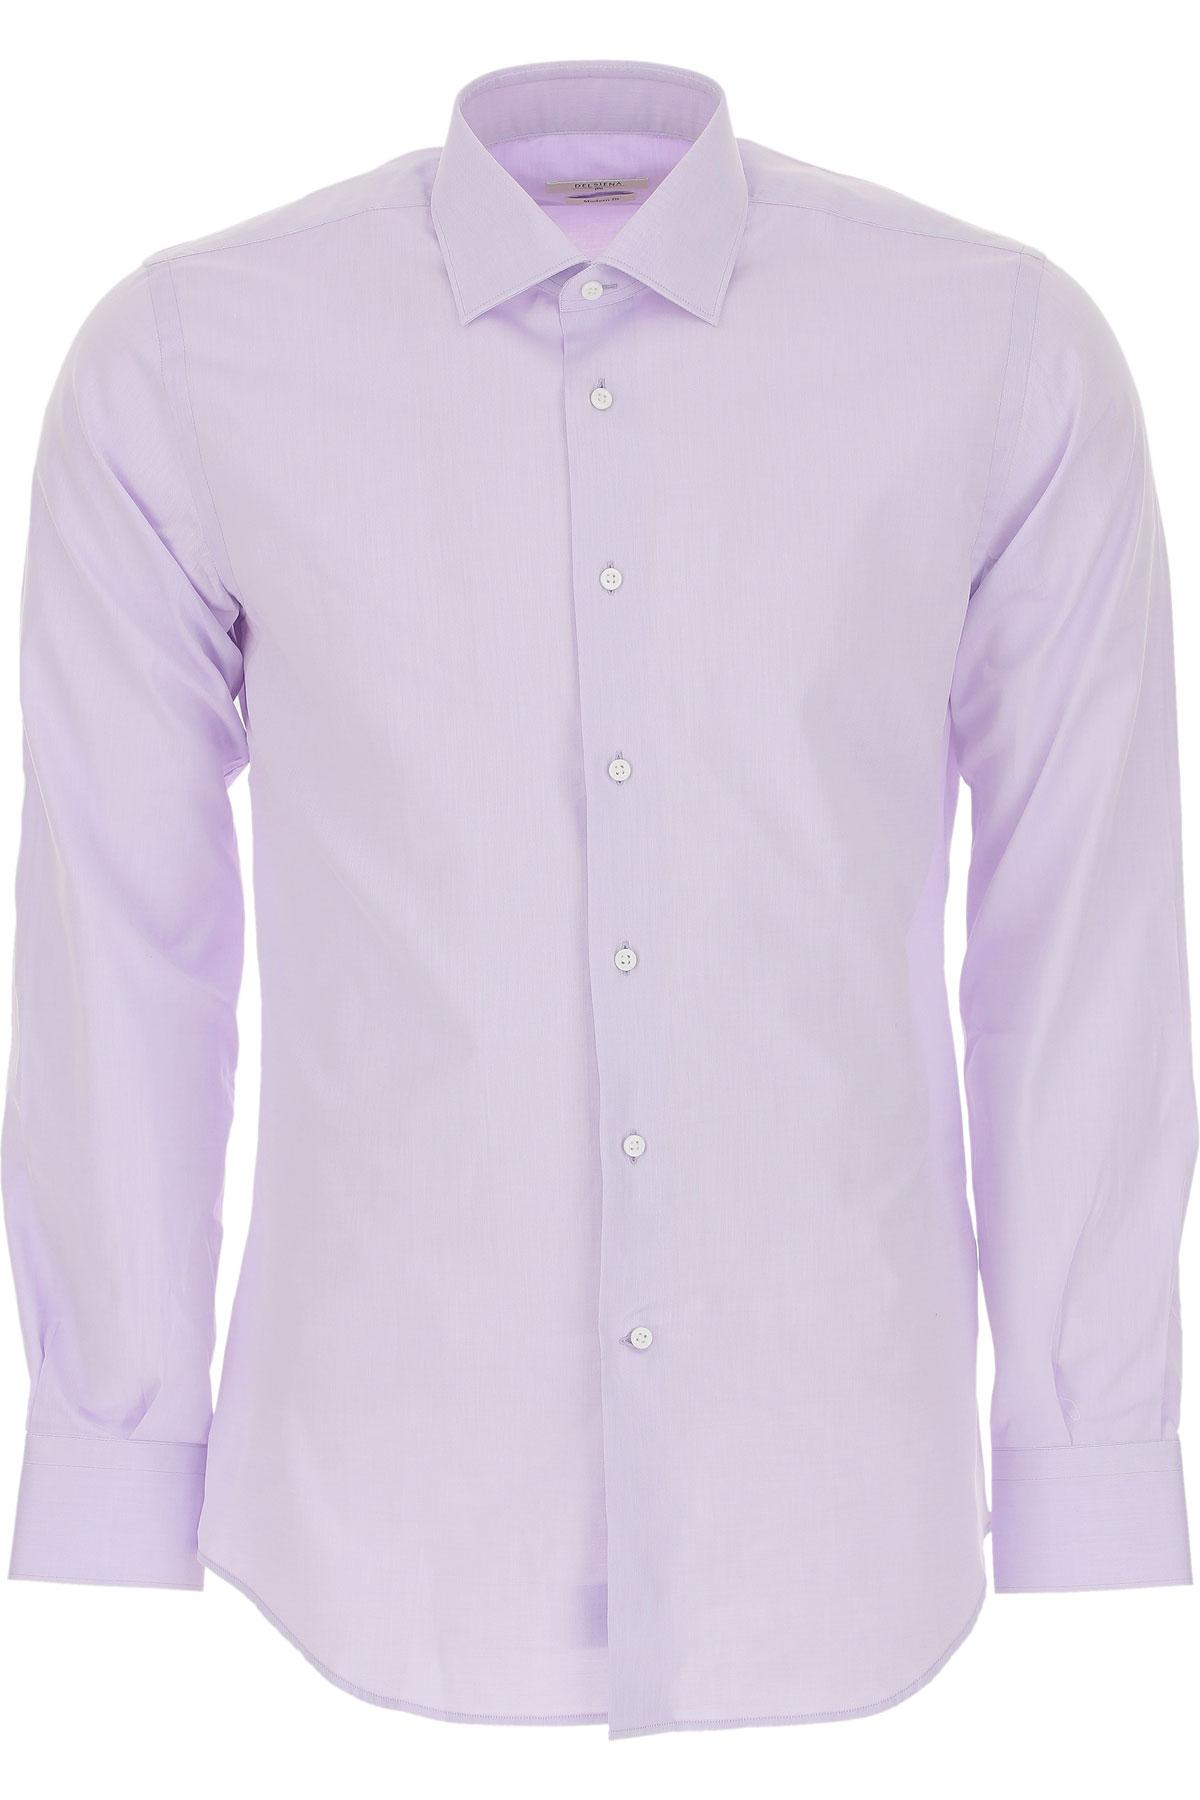 Del Siena Shirt for Men On Sale, Lilac, Cotton, 2019, 15.5 15.75 16 16.5